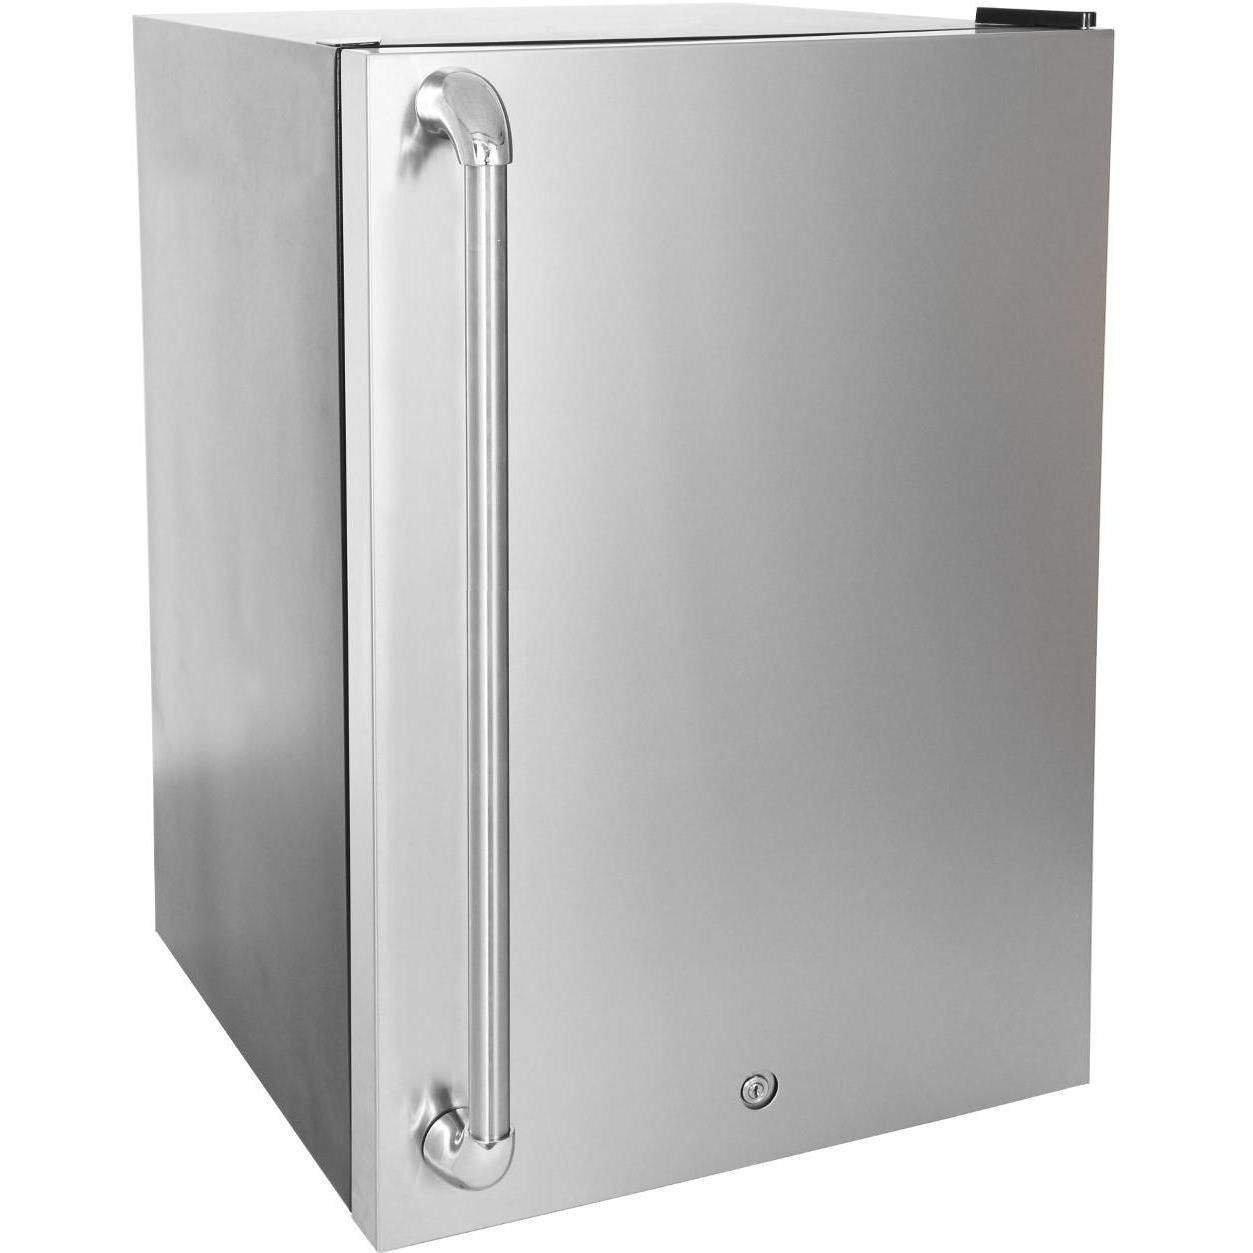 Blaze Stainless Front Door Upgrade 4.5 for Right Hinge (BLZ-SSRF130-BLZ-SSFP-4-5) by Blaze